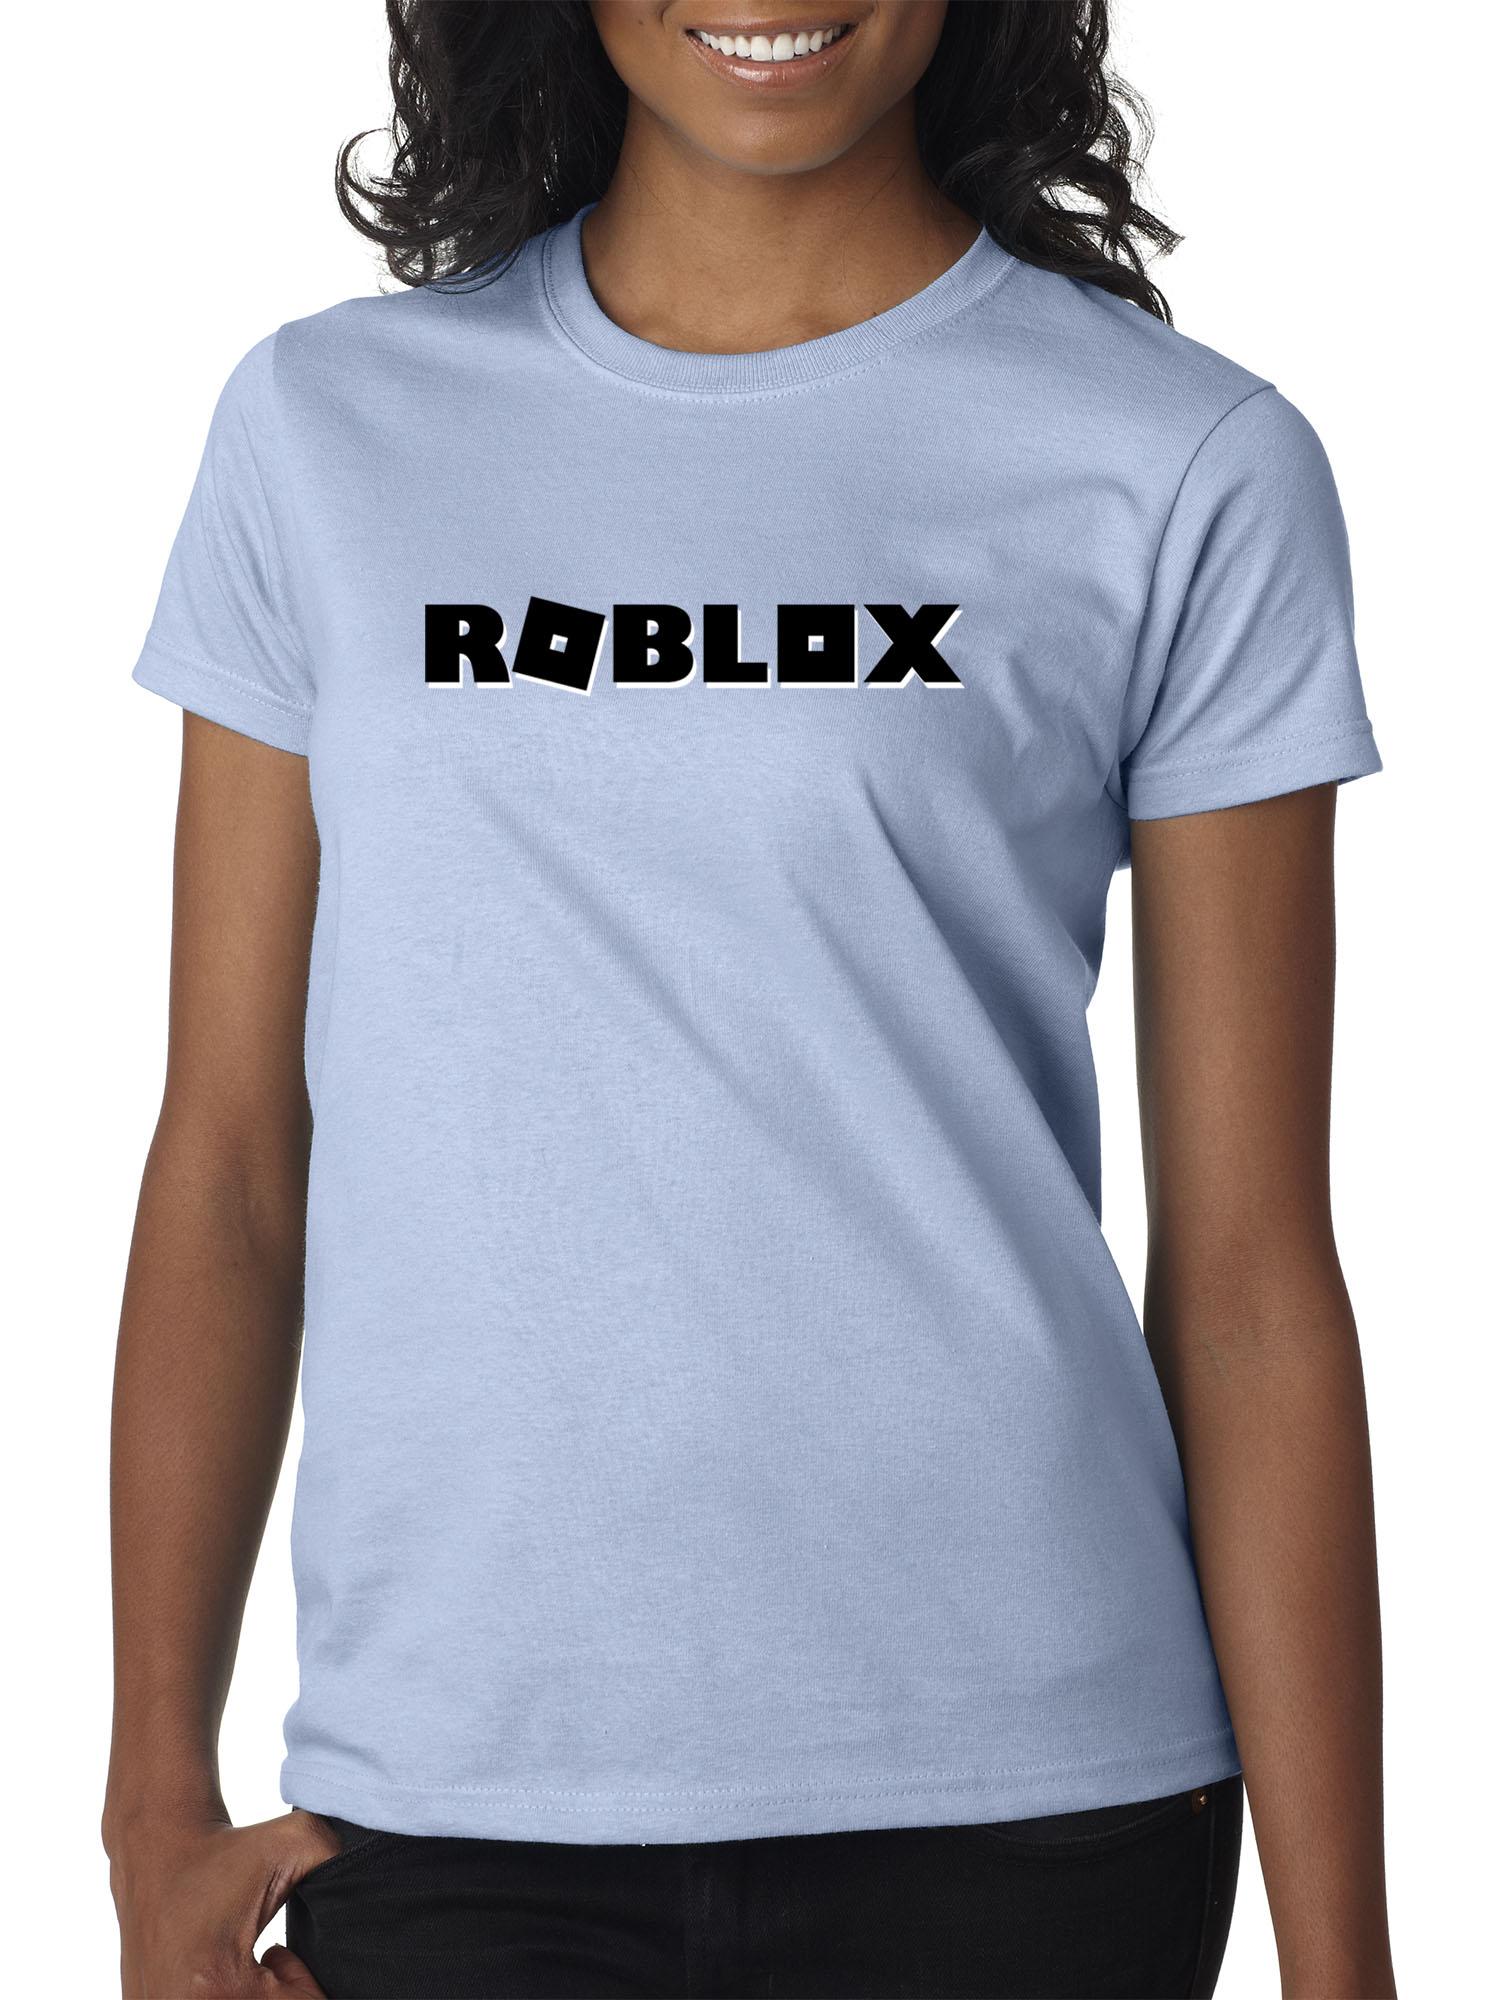 Blue T Shirt Roblox Trendy Usa Trendy Usa 1168 Women S T Shirt Roblox Block Logo Game Accent Large Light Blue Walmart Com